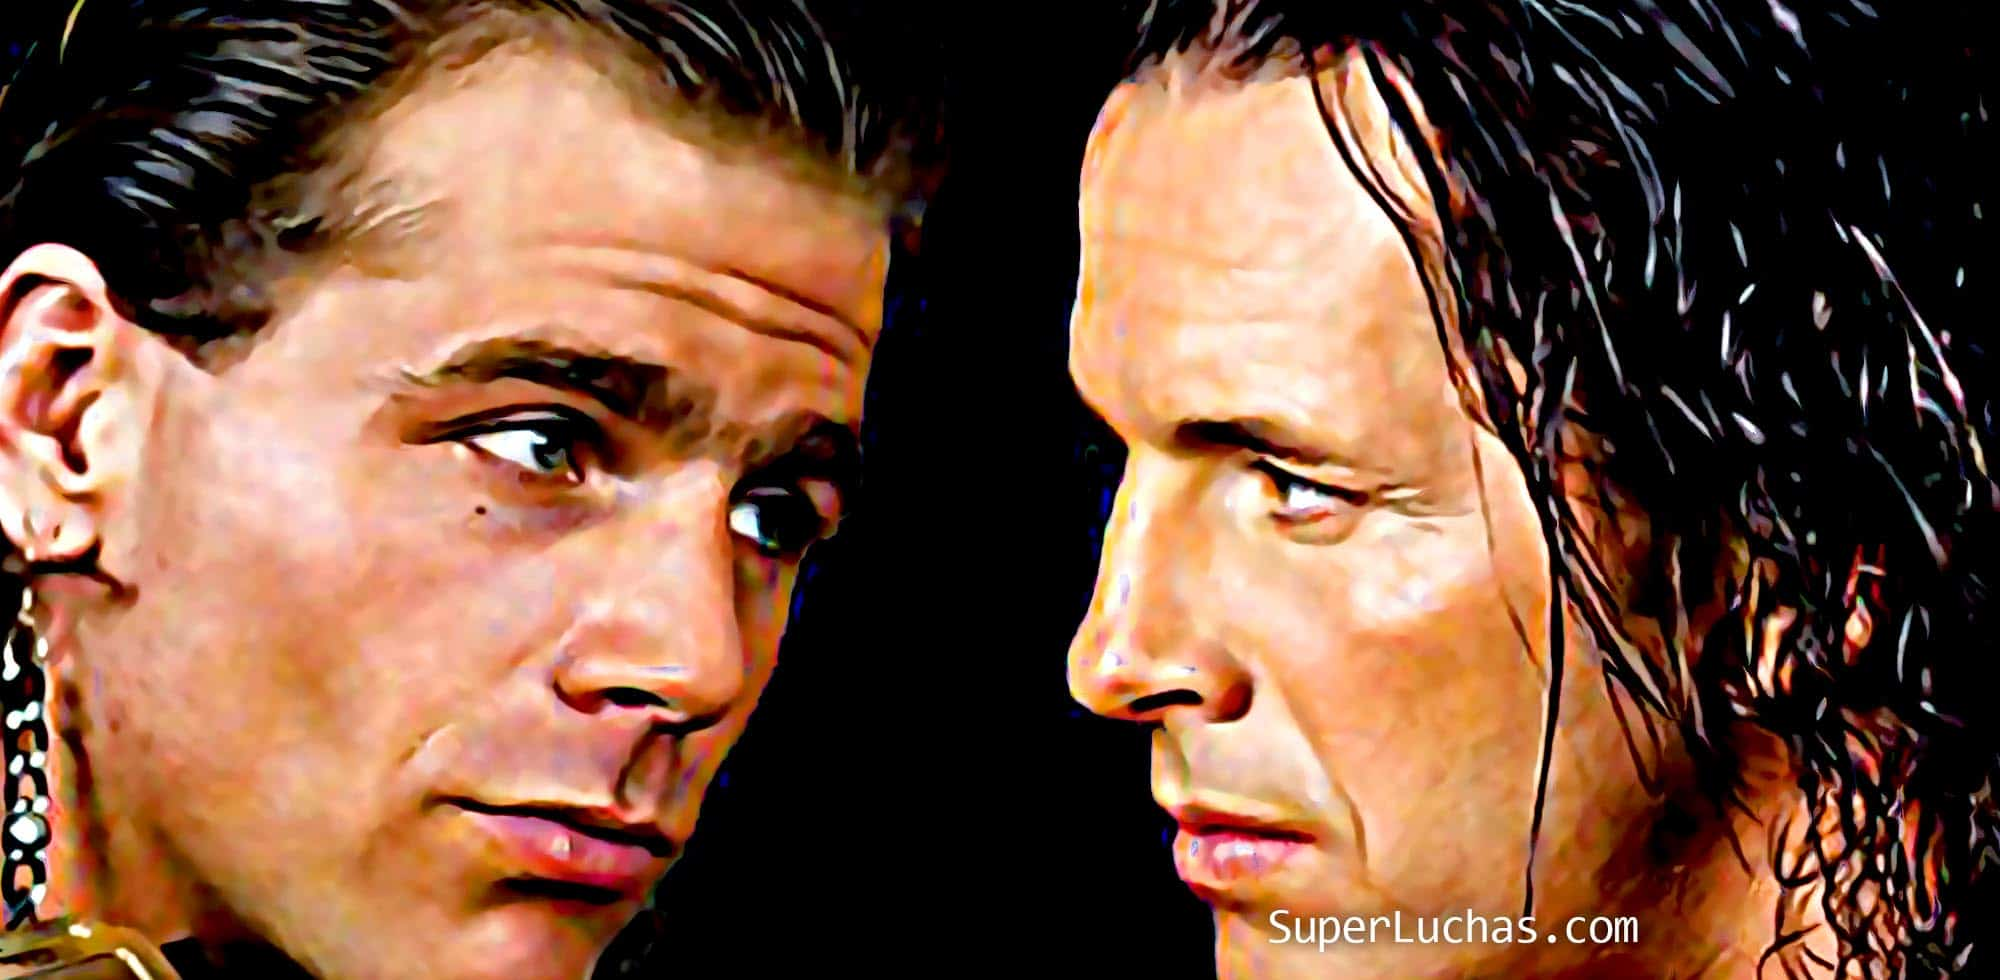 Jake Roberts critica a Bret Hart y Shawn Michaels